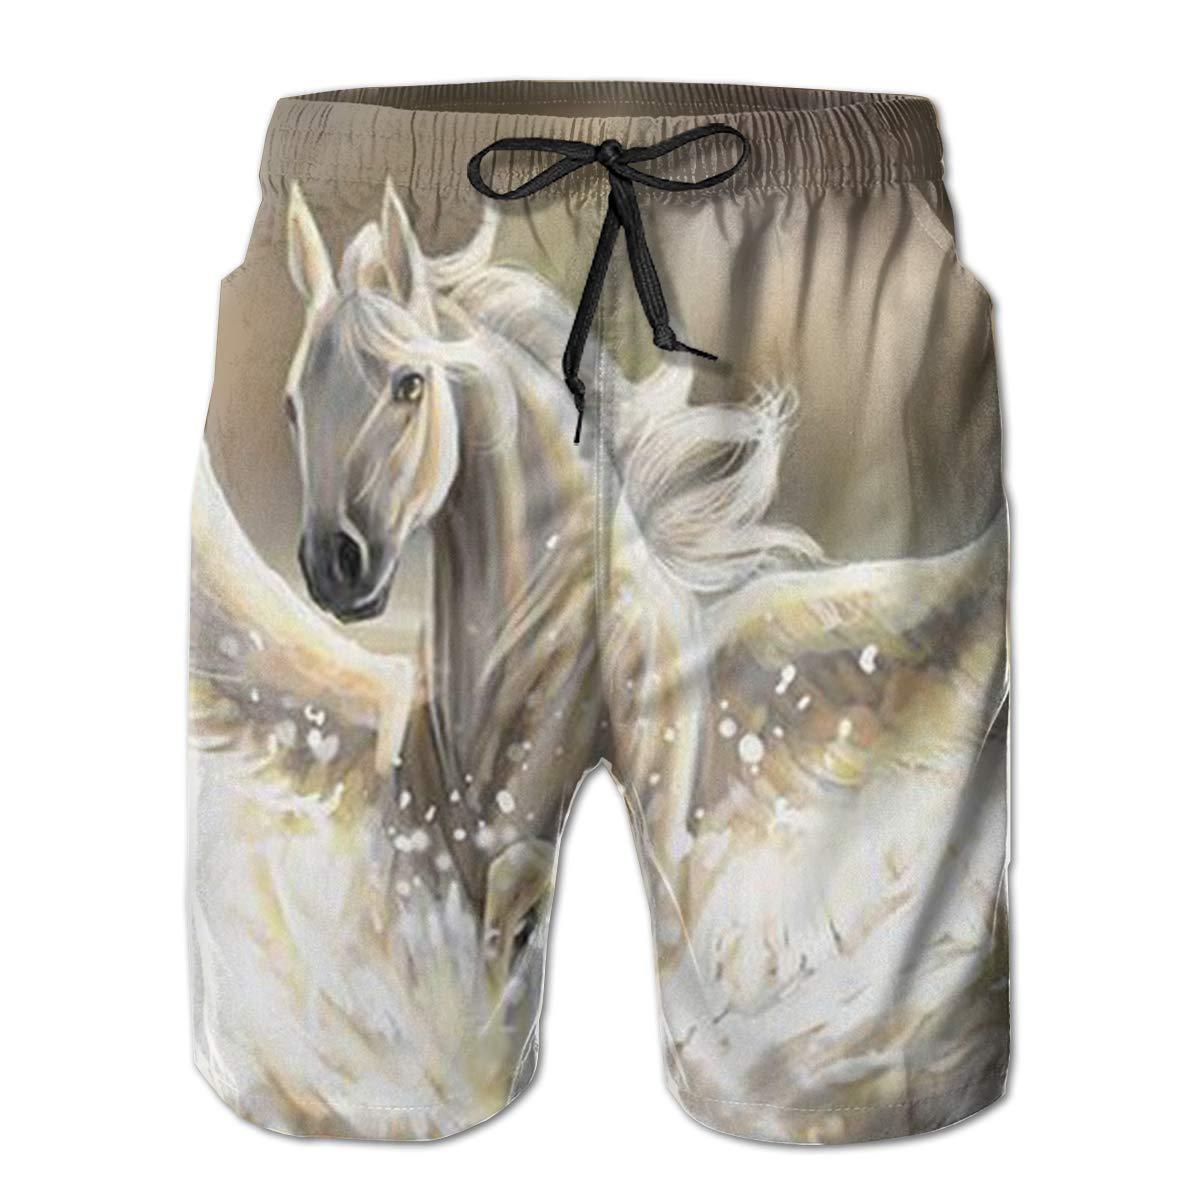 Wexzss Pegasus Funny Summer Quick-Drying Swim Trunks Beach Shorts Cargo Shorts